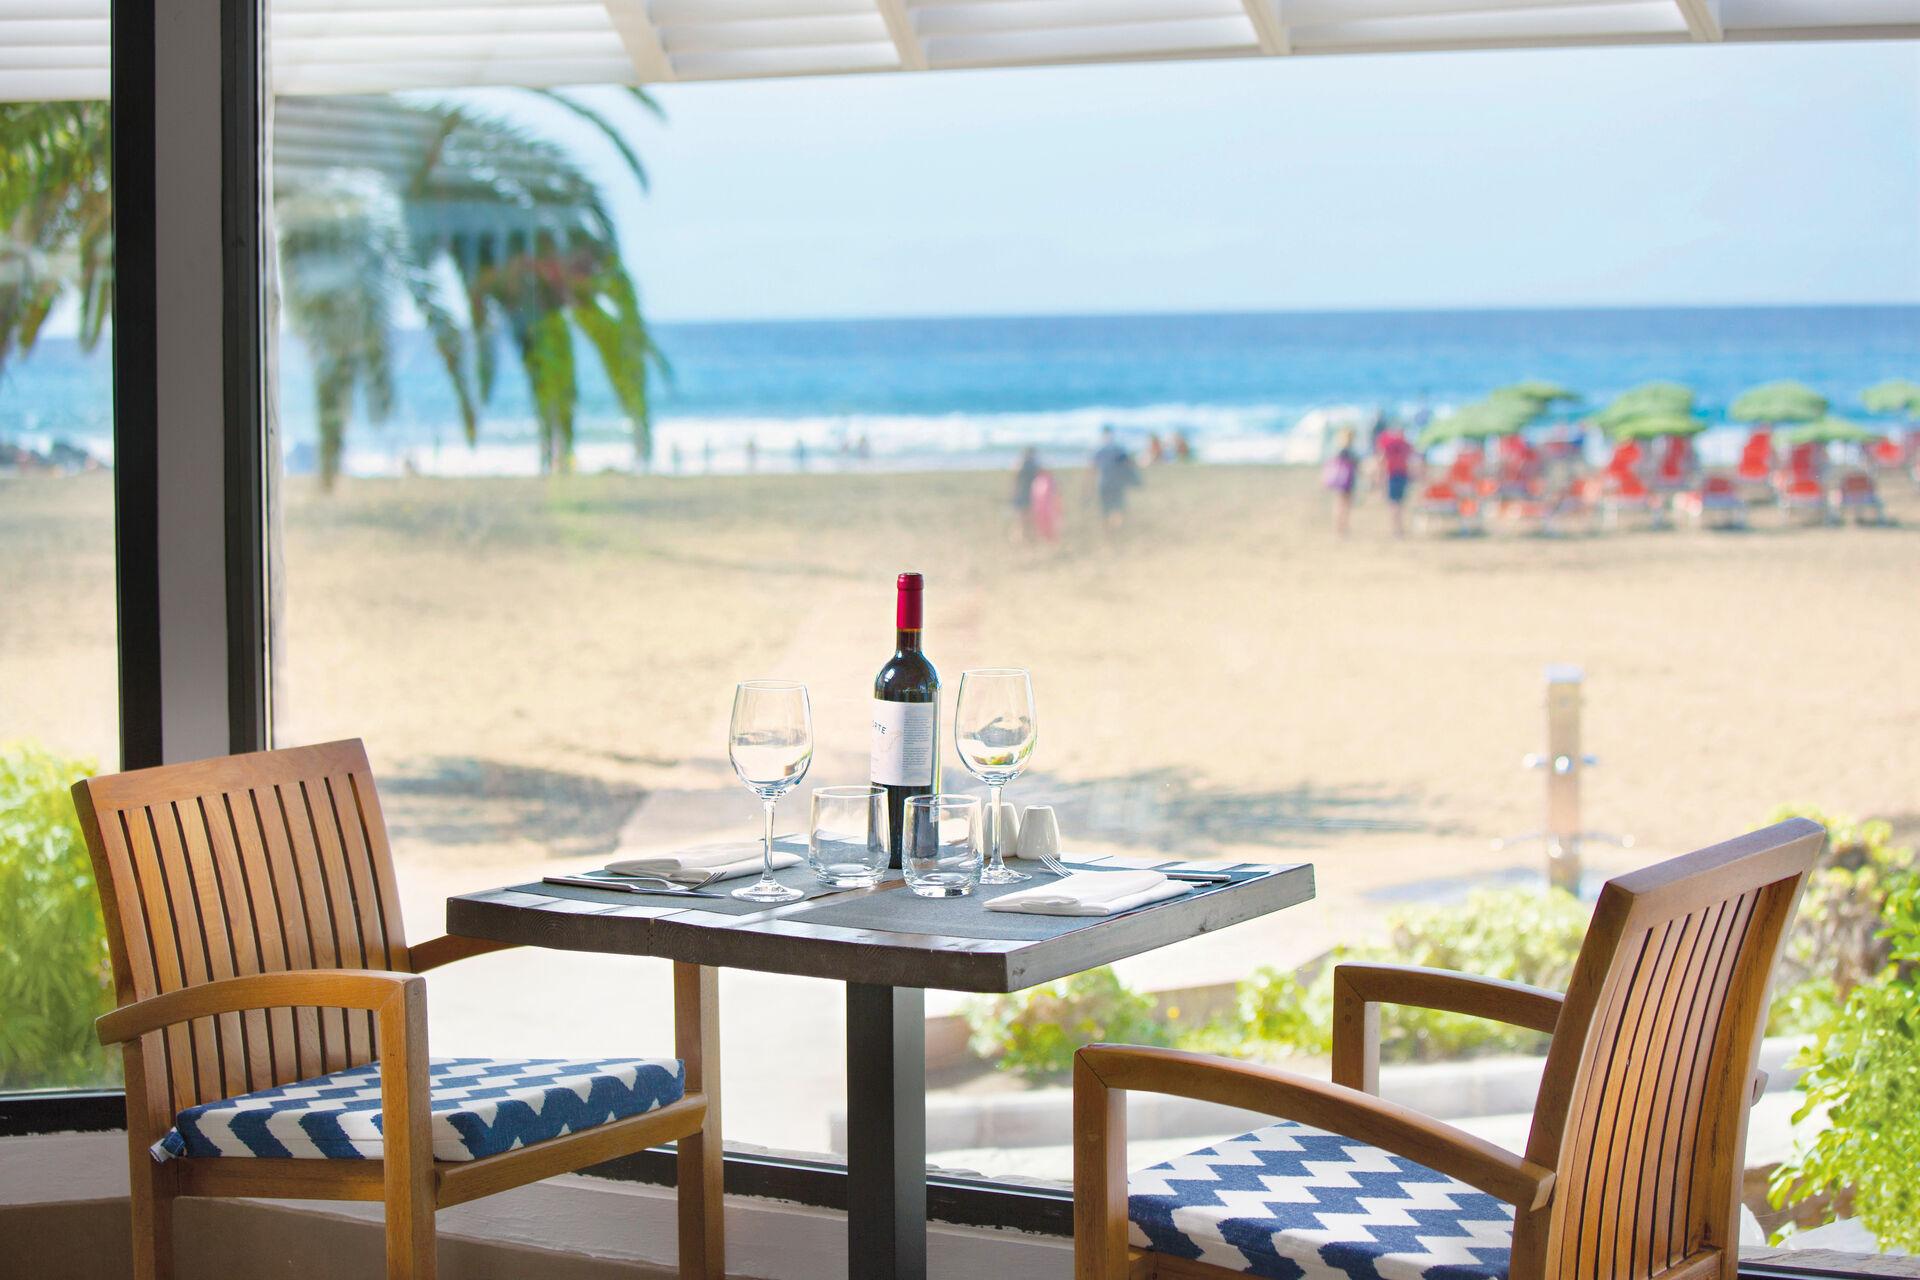 Corallium Beach by Lopesan Hotels - 3*